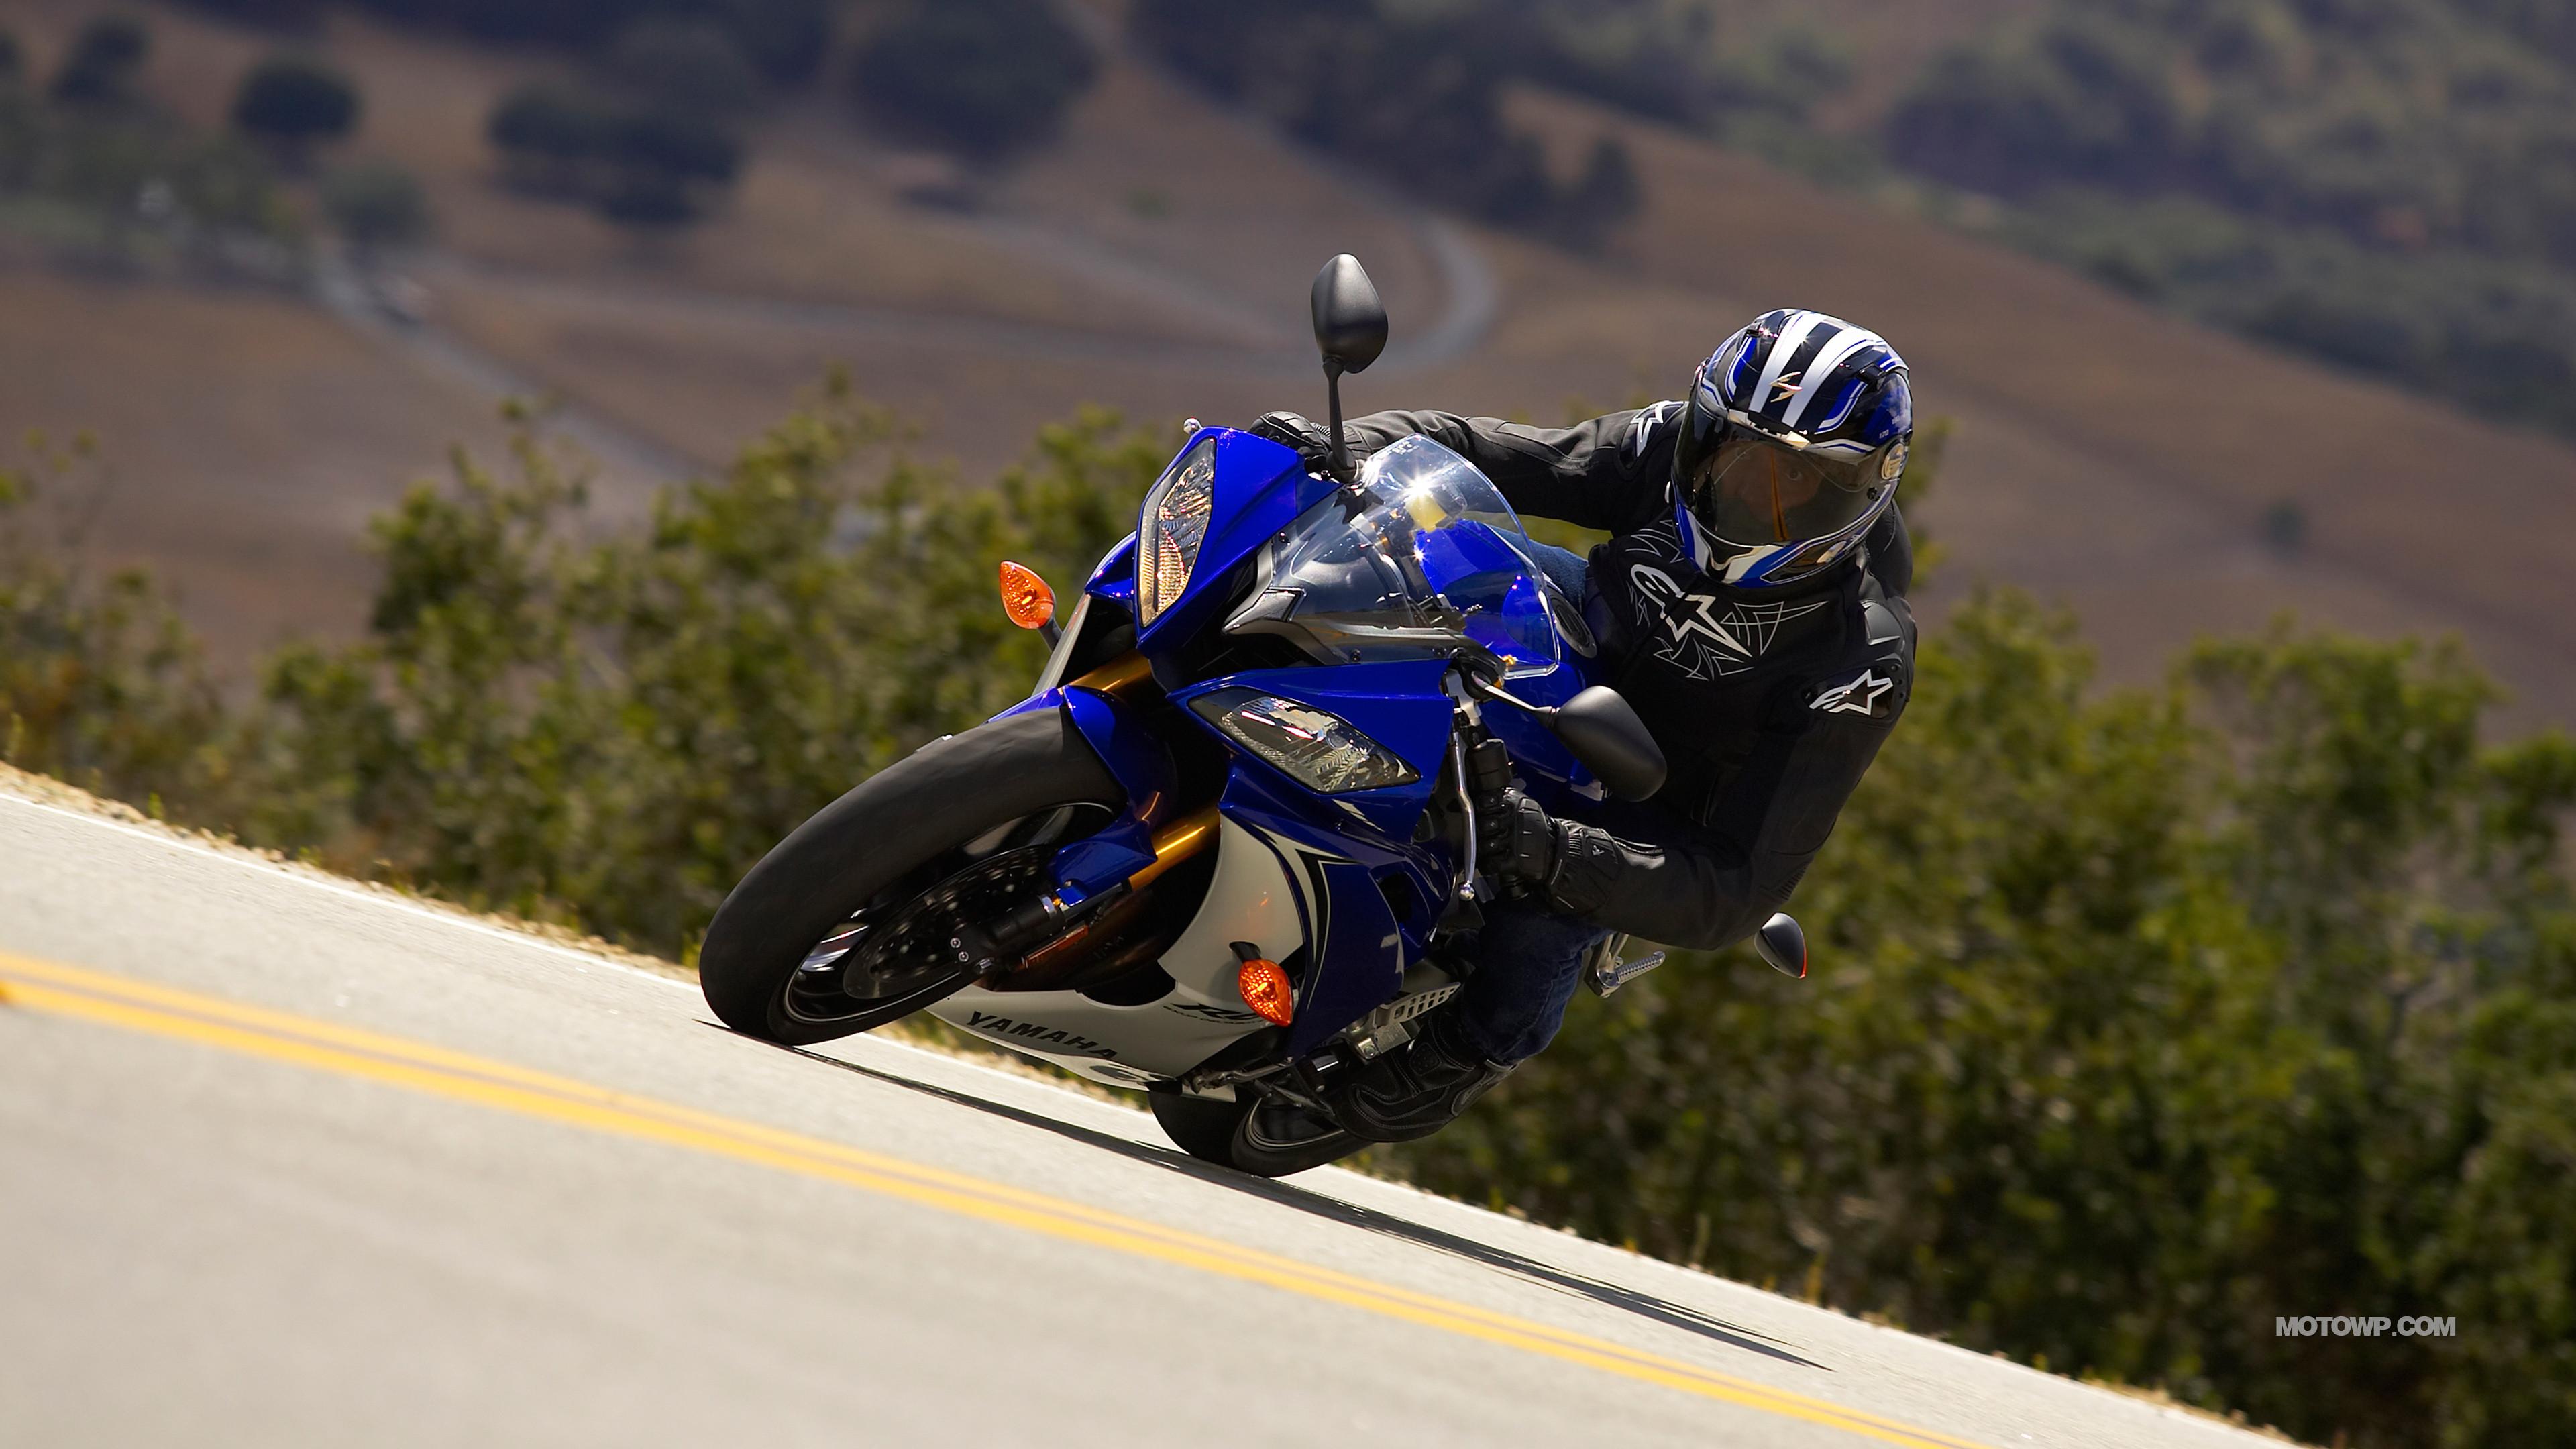 Motorcycle wallpapers Yamaha YZF-R6 …